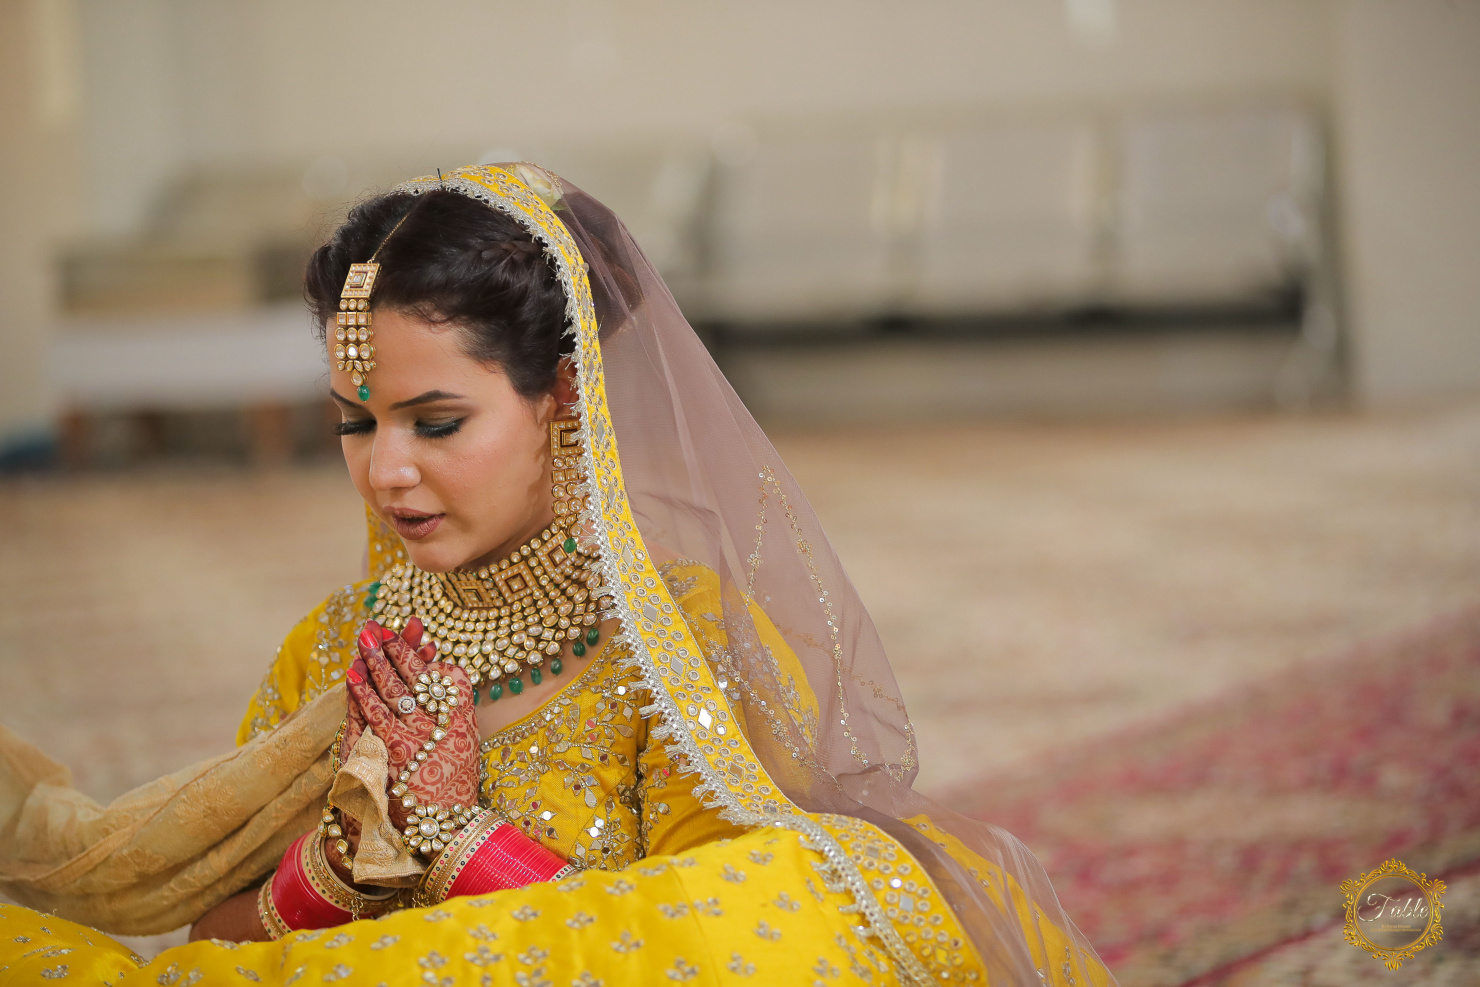 bride in yellow lehenga and contrasting jewellery